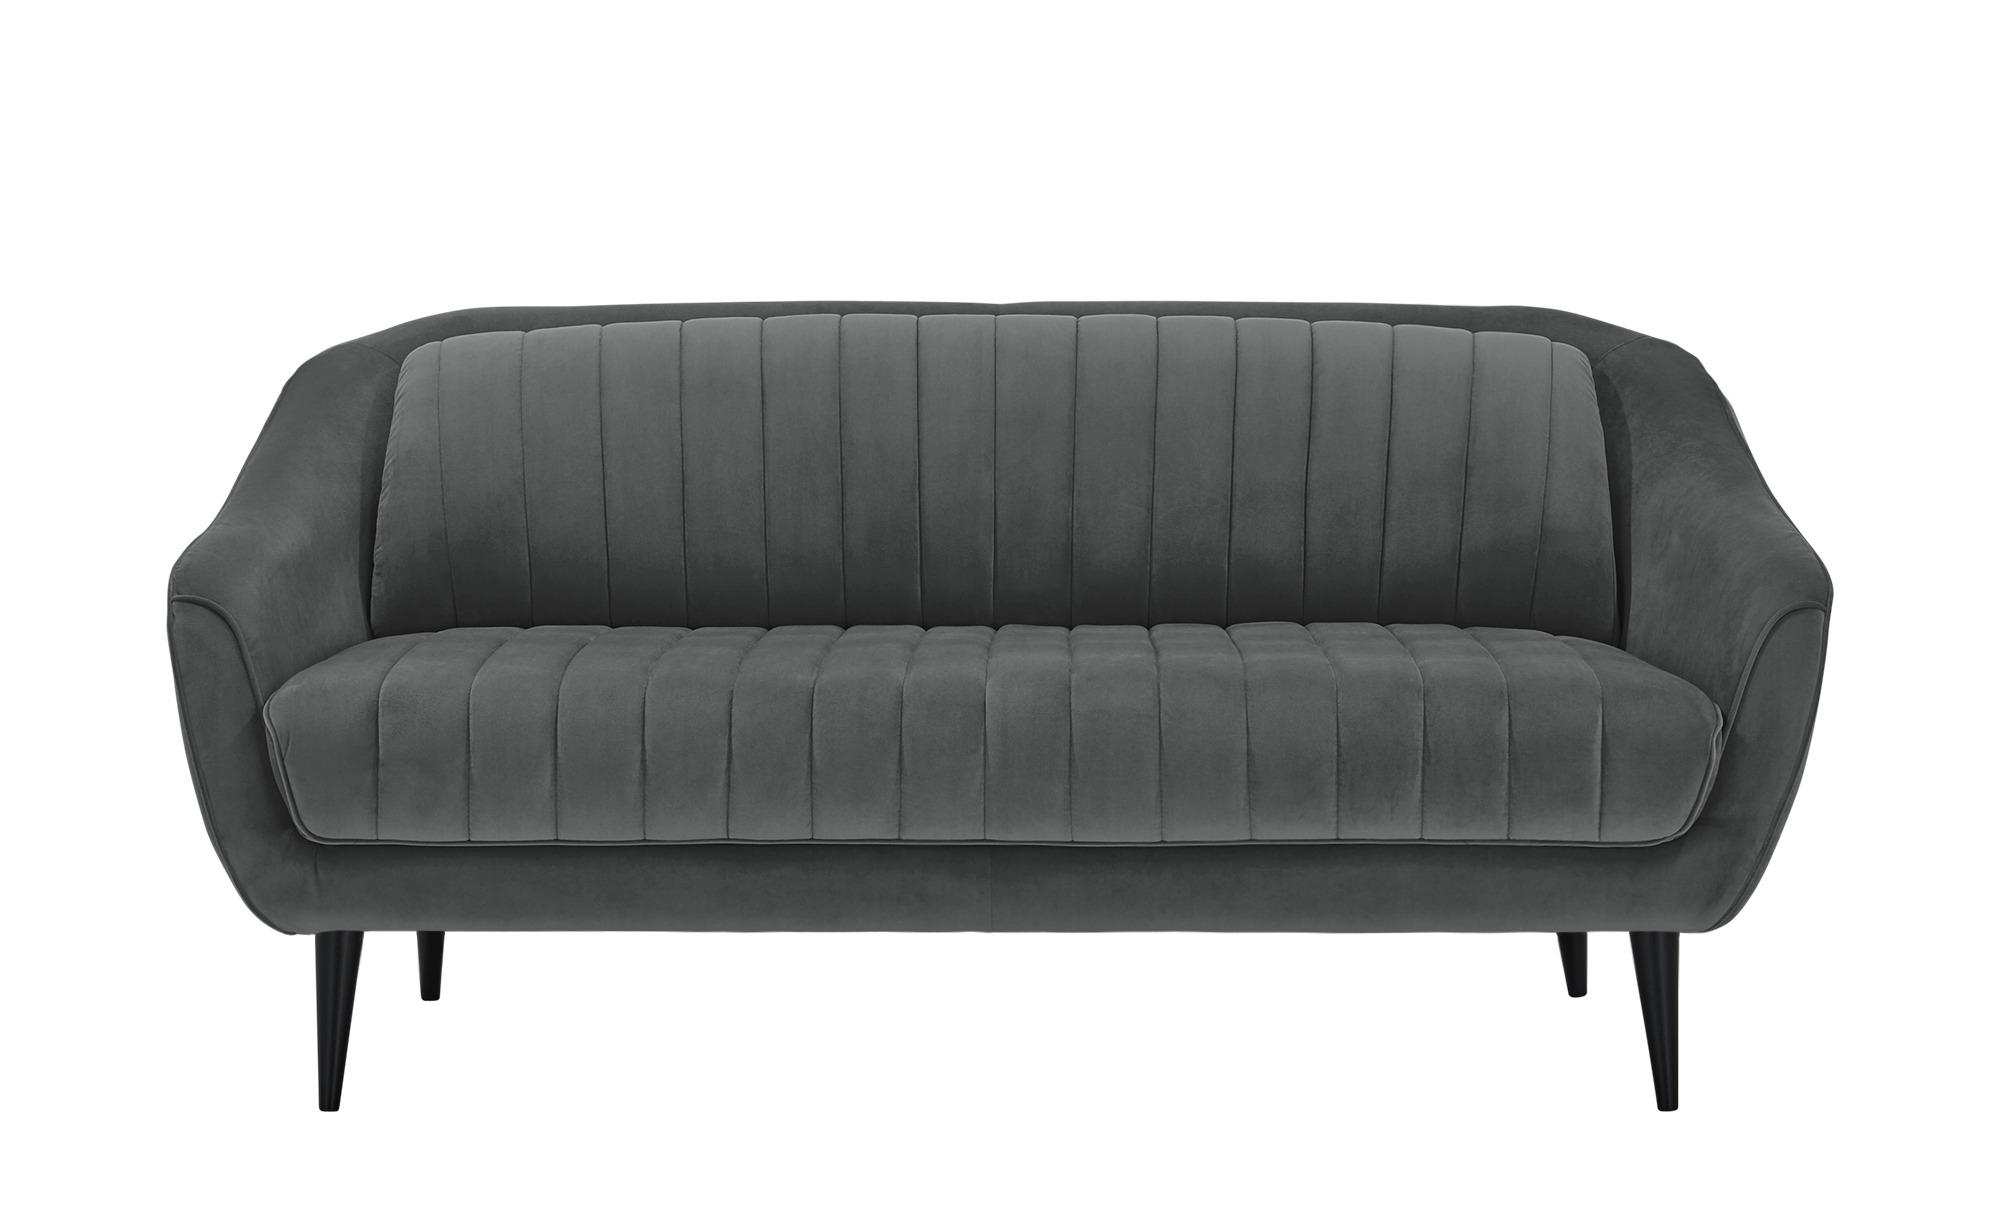 Sofa  Sophia ¦ grau ¦ Maße (cm): B: 190 H: 83 T: 90 Polstermöbel > Sofas > Einzelsofas - Höffner